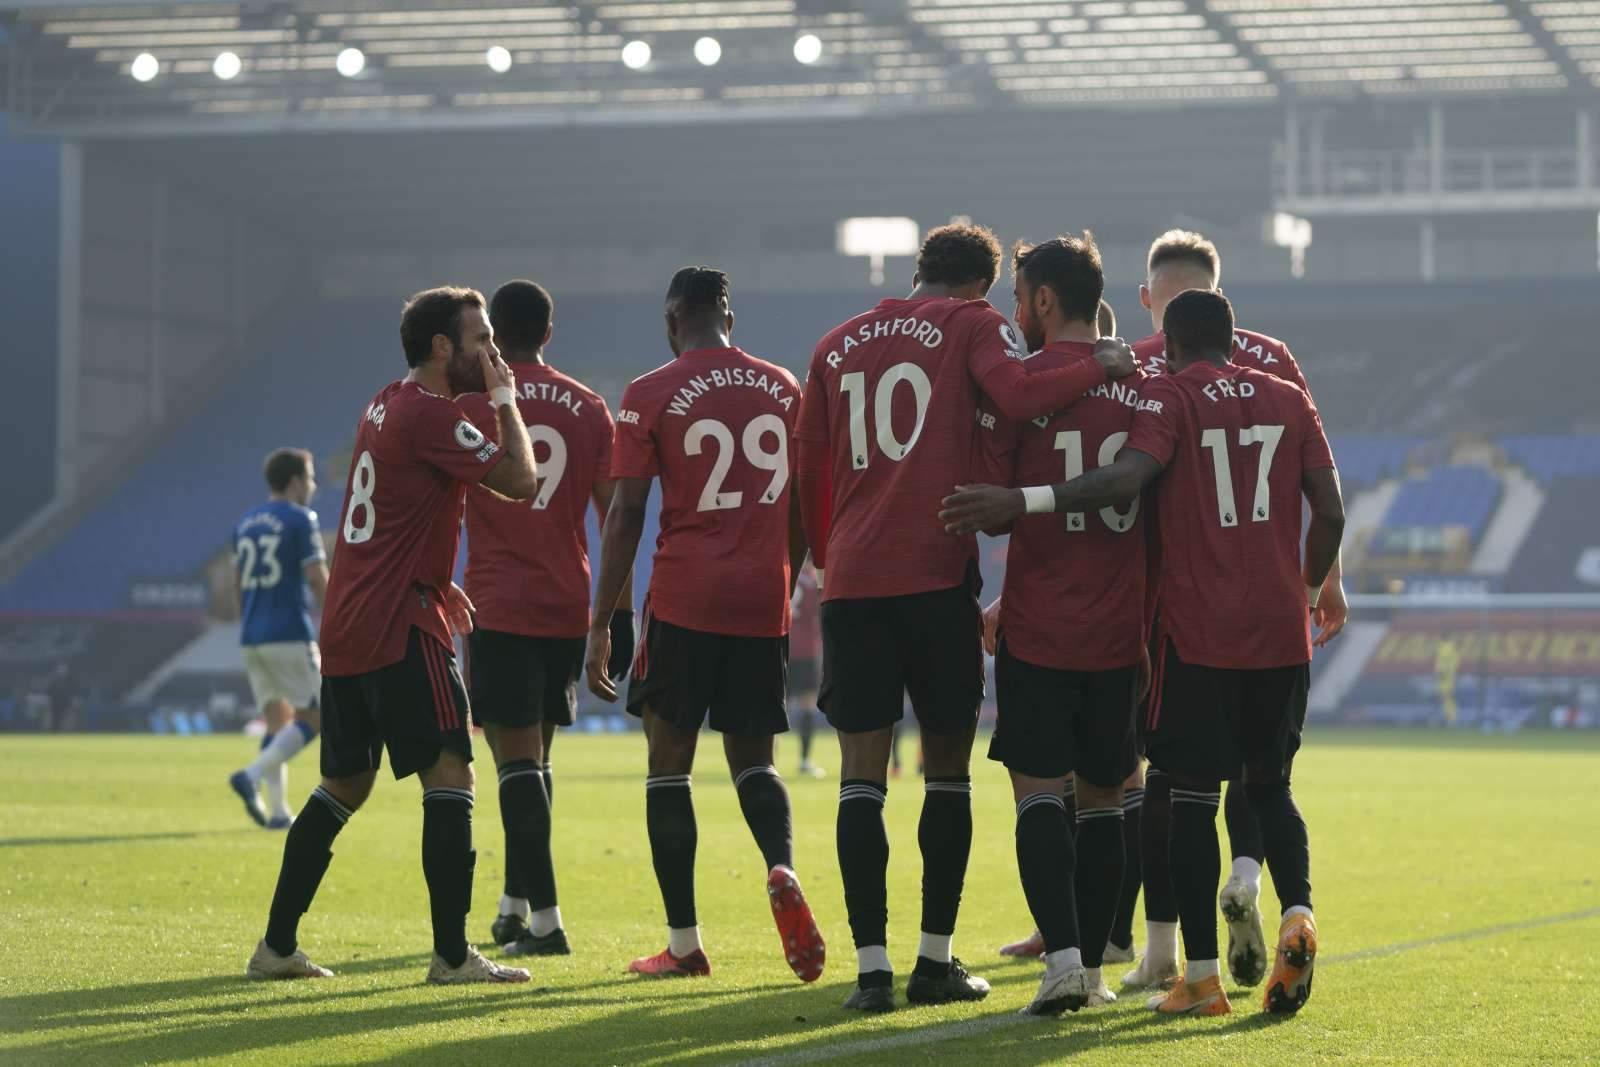 «Кристал Пэлас» - «Манчестер Юнайтед»: прогноз на матч чемпионата Англии – 3 марта 2021